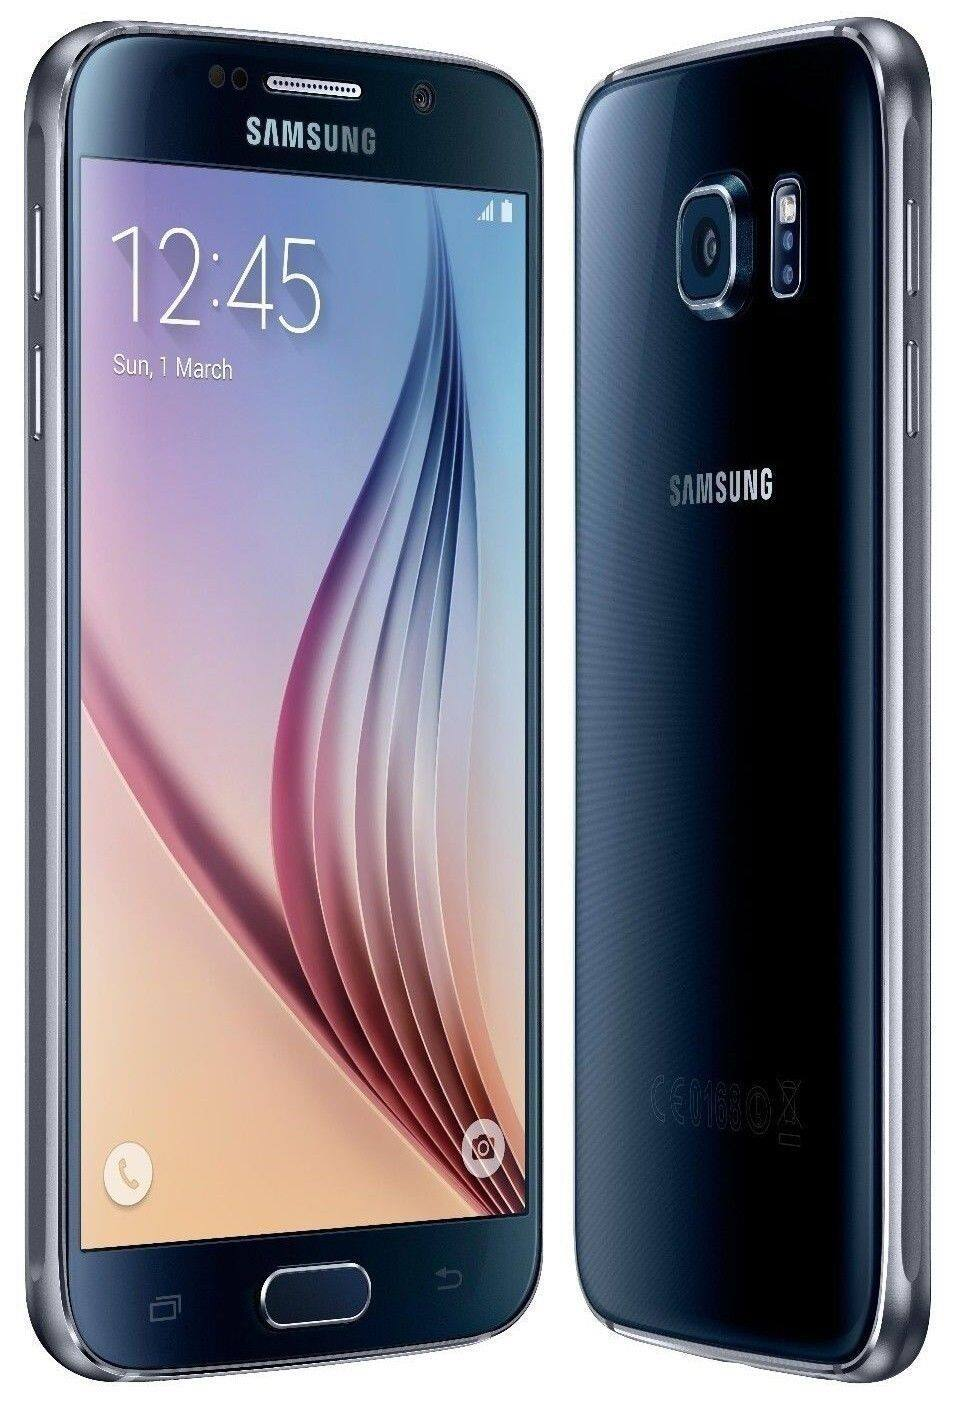 Samsung Galaxy S6 G920F 32GB Unlocked 16MP Smartphone $529.99 + Free Shipping (eBay Daily Deal)